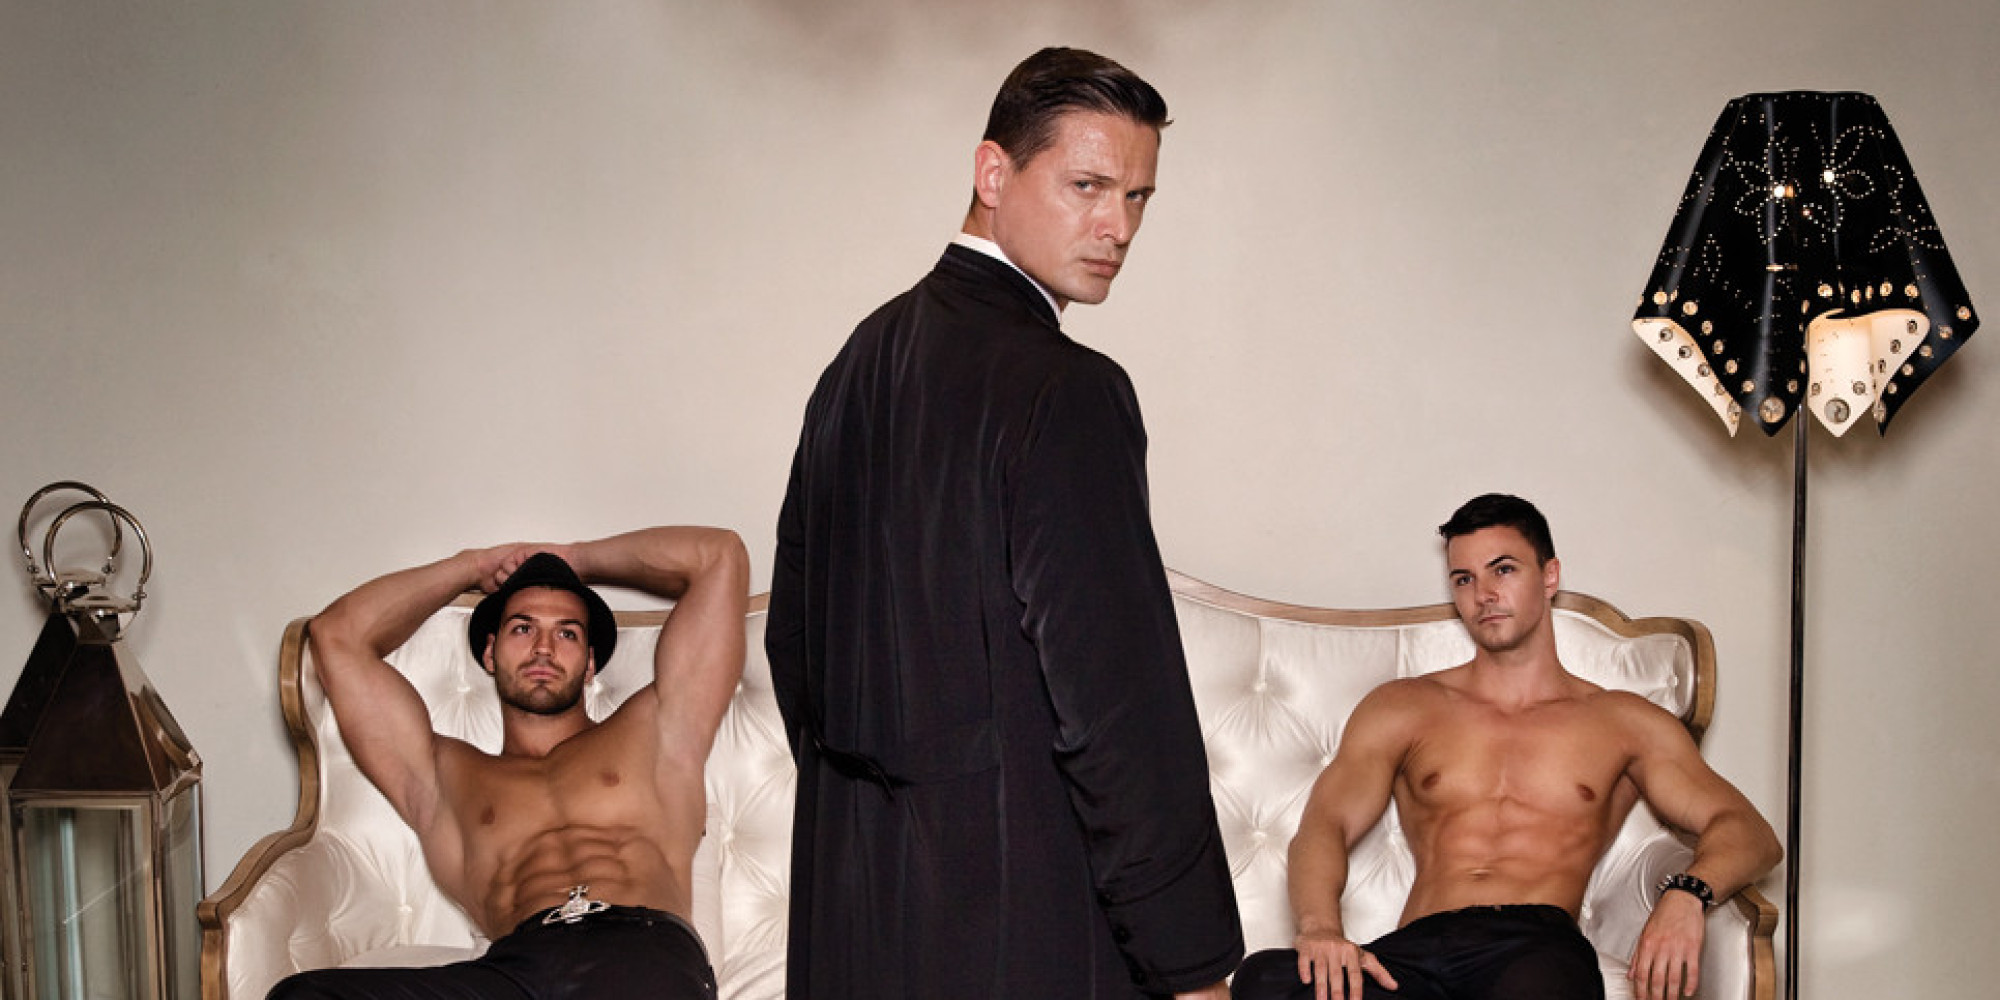 gay catholic priests